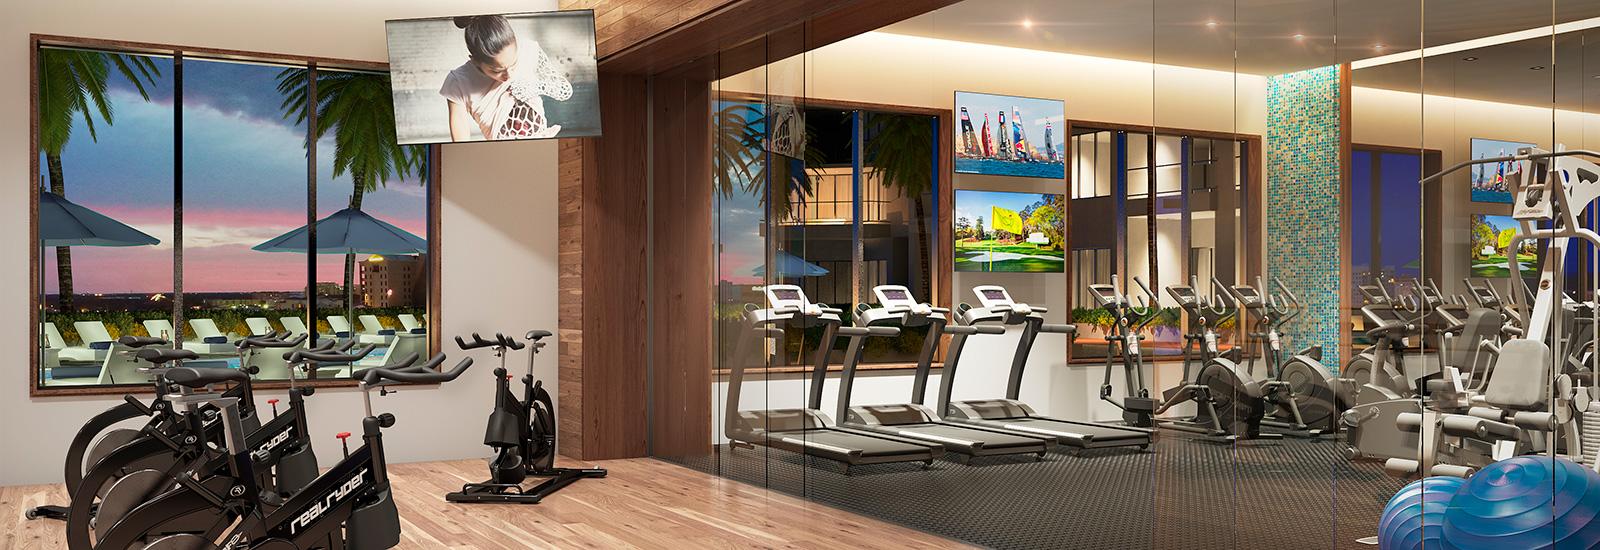 1600x550-TheMark-gym.jpg